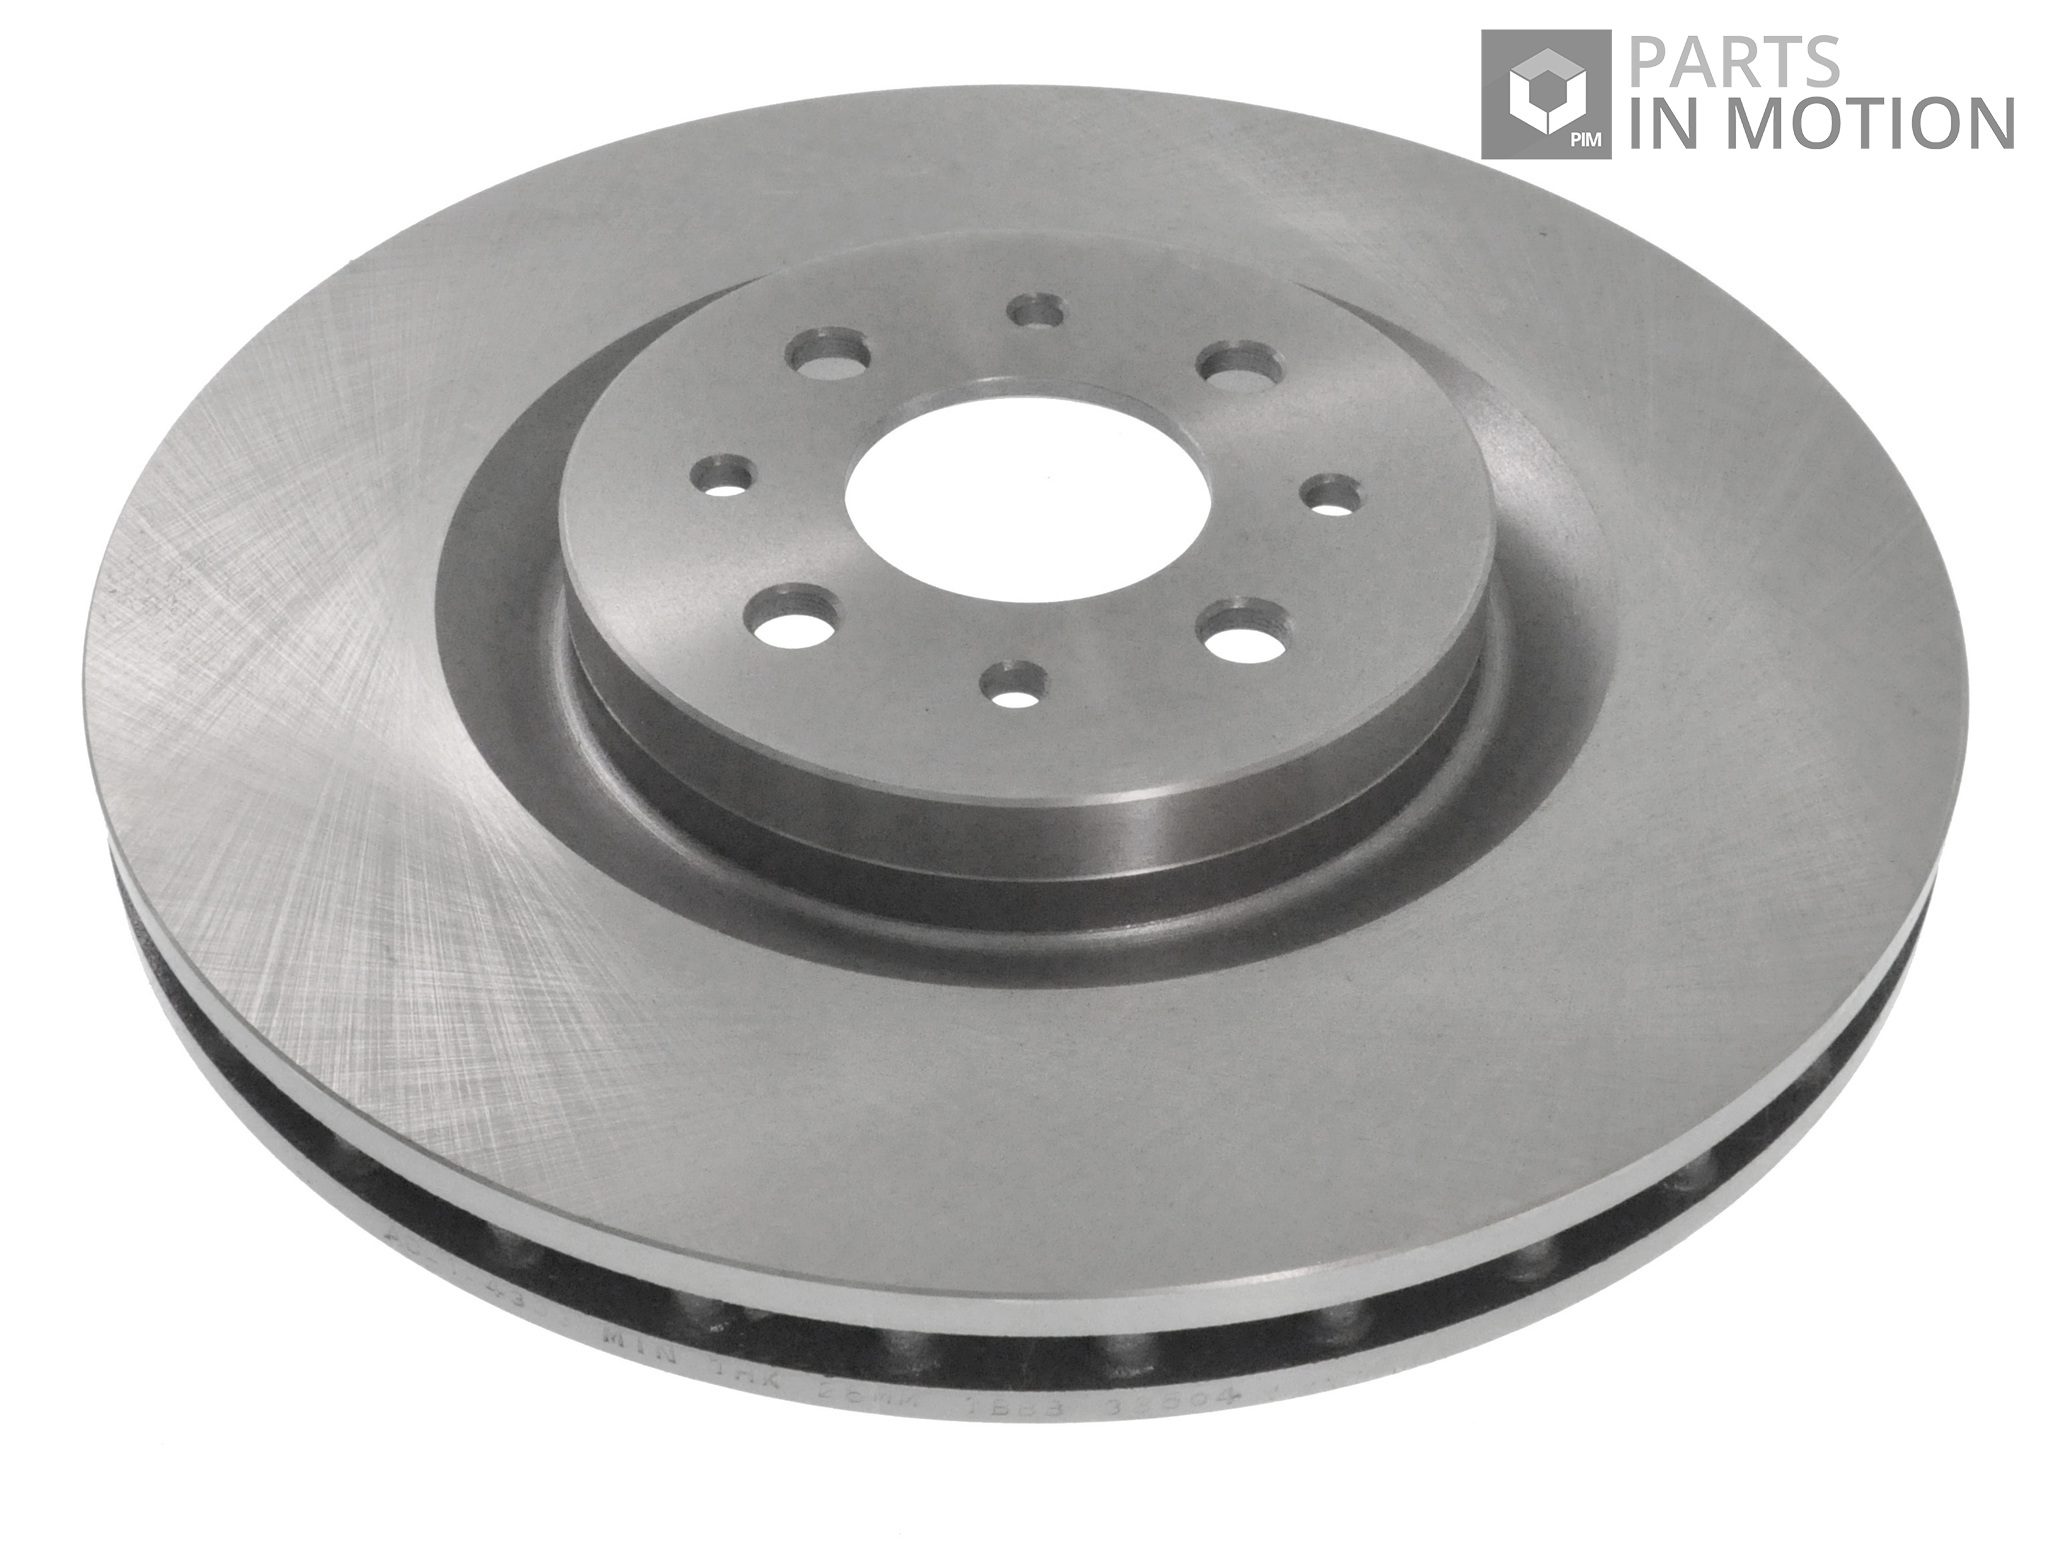 Details about 2x Brake Discs (Pair) Vented Front 305mm ADL144303 Blue Print  Set 51813785 New